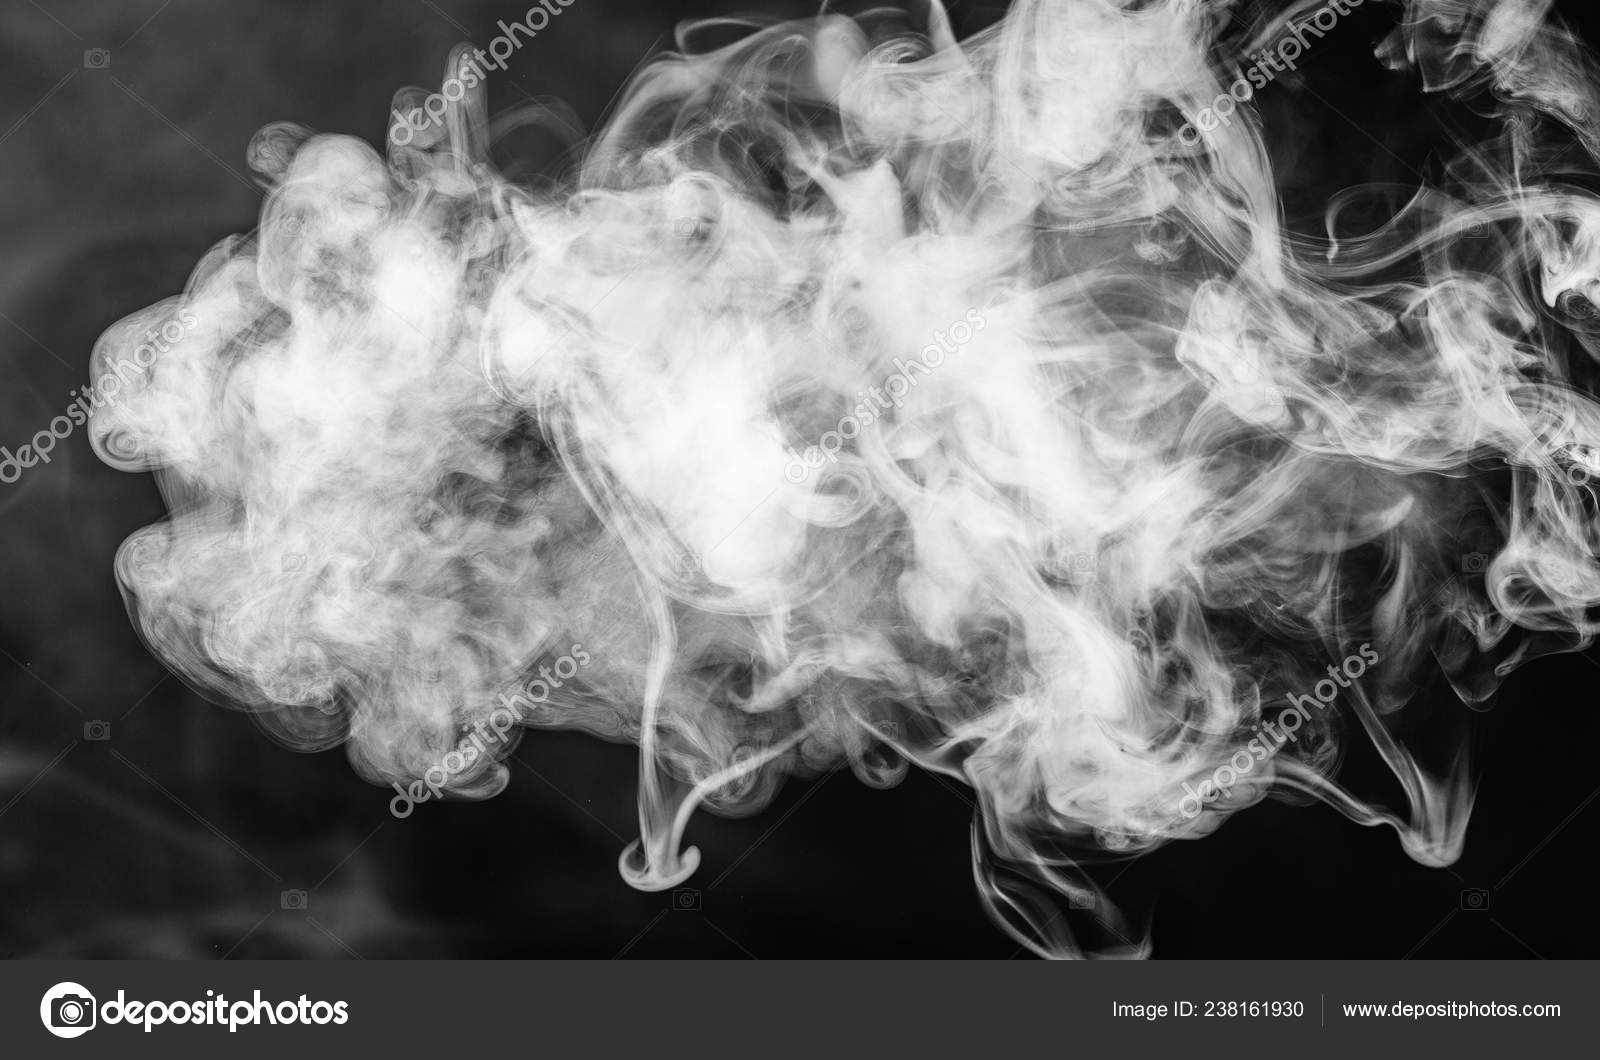 smoke png cloud white psd mist light stock photo c billiondigital 238161930 smoke png cloud white psd mist light stock photo c billiondigital 238161930